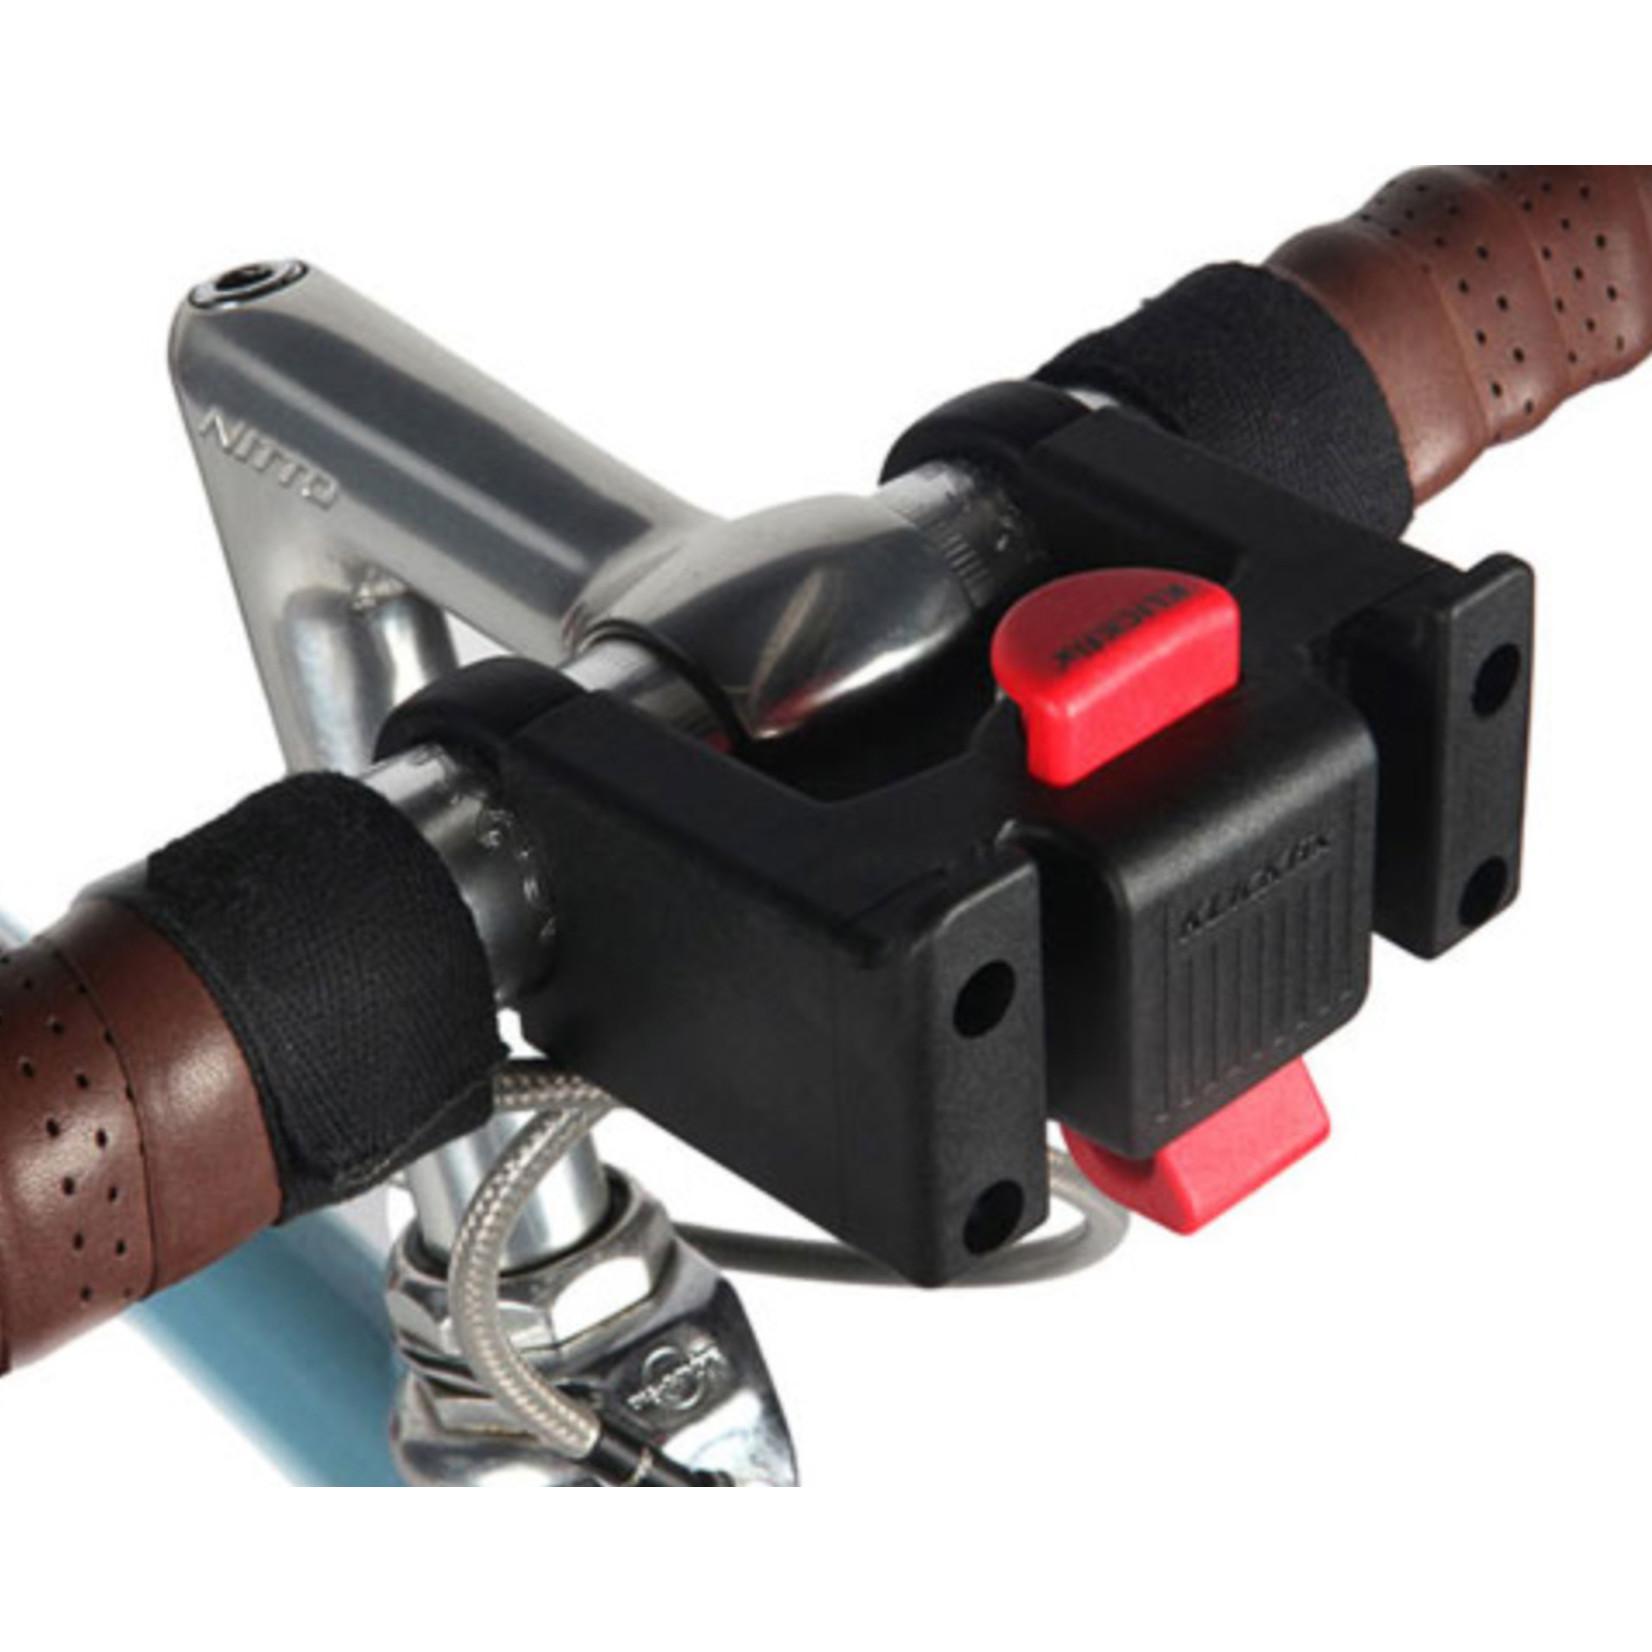 Klickfix Handlebar Adapter (for Swift Ind. Paloma)